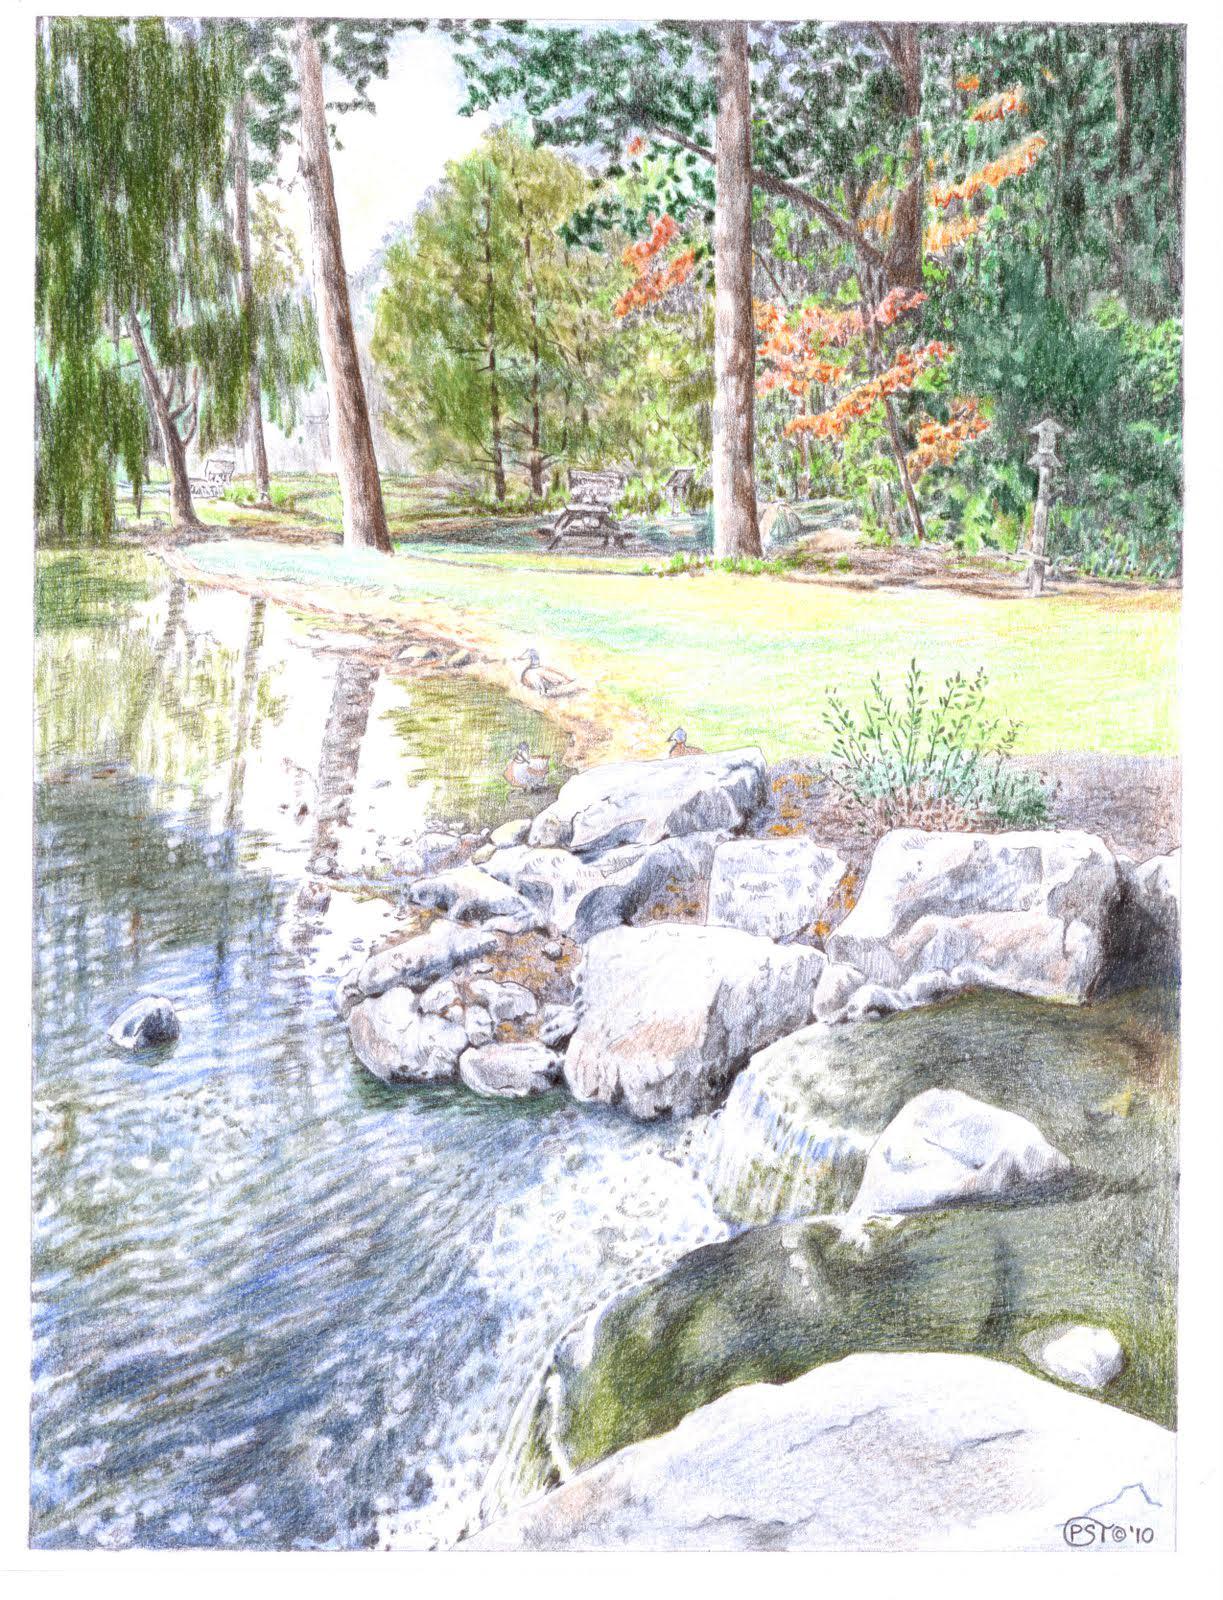 James Madison University Arboretum